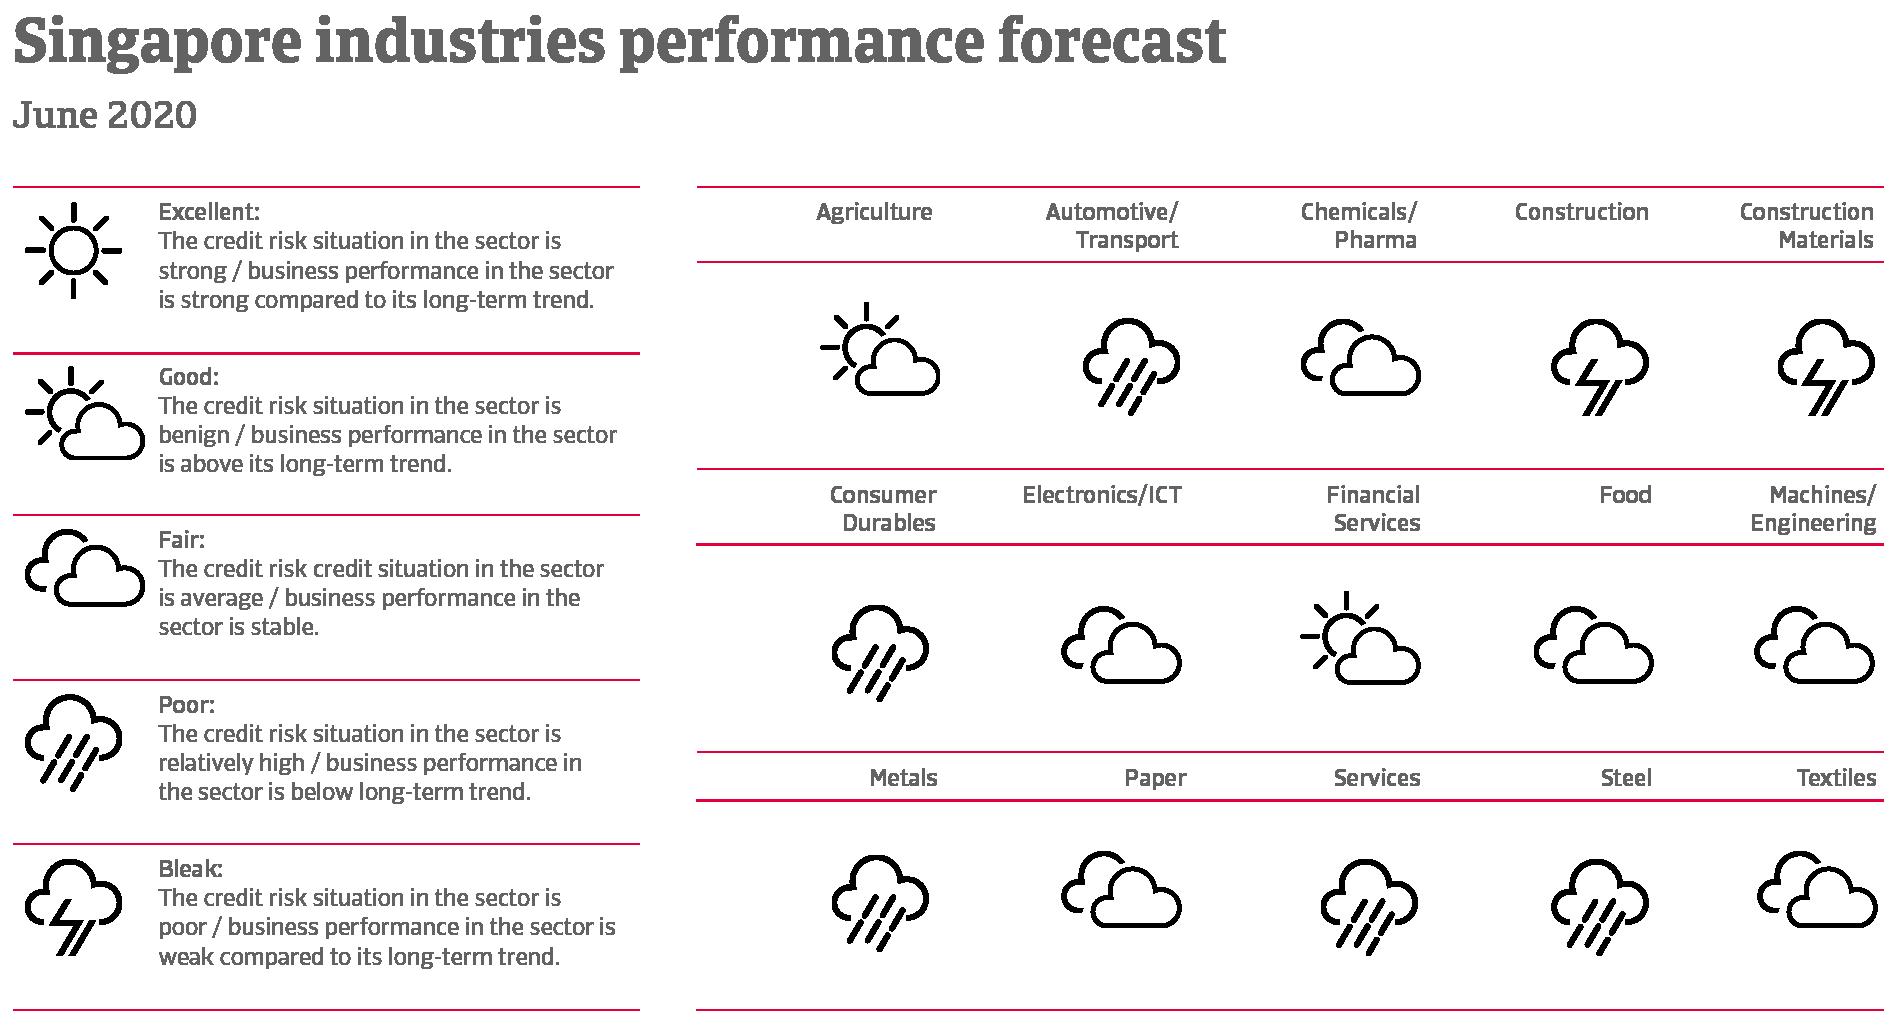 Performance forecast of Singaporean industries